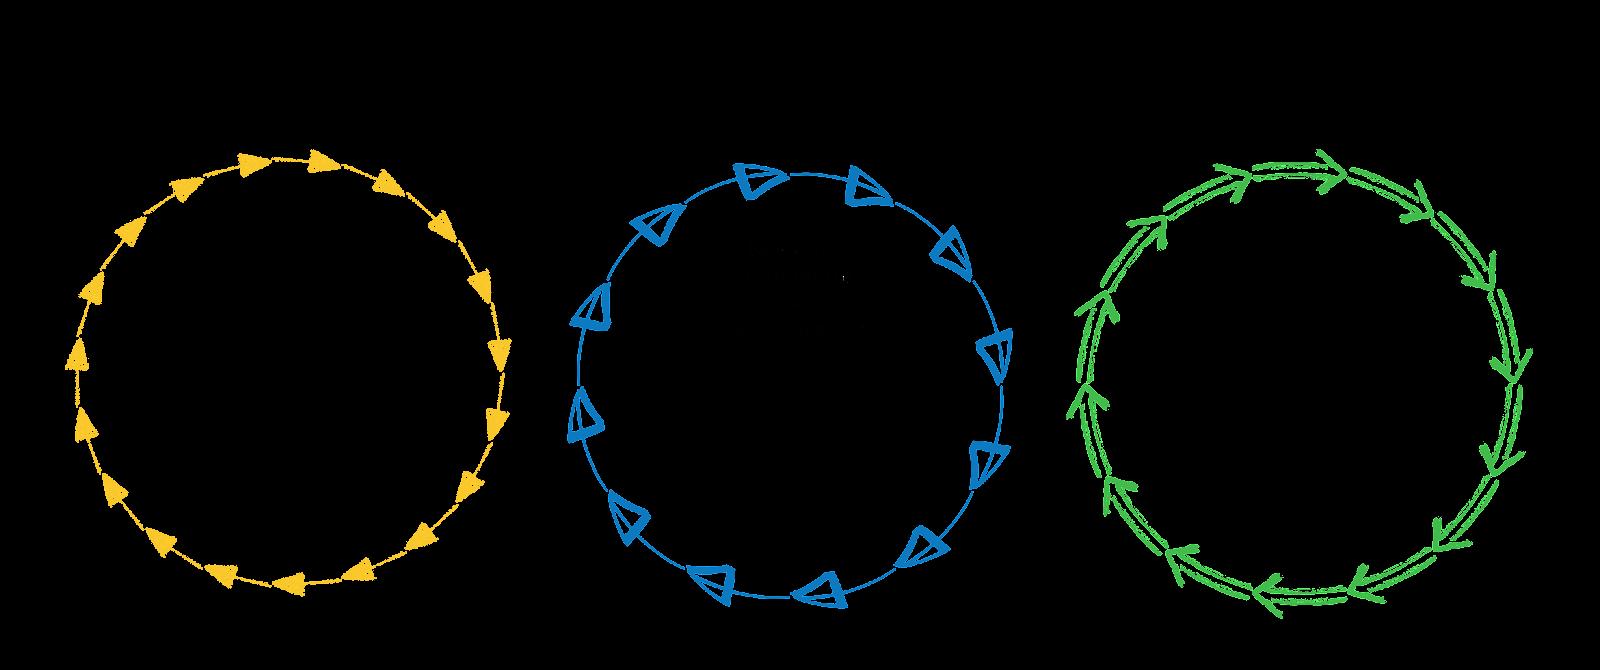 CI/CD illustration